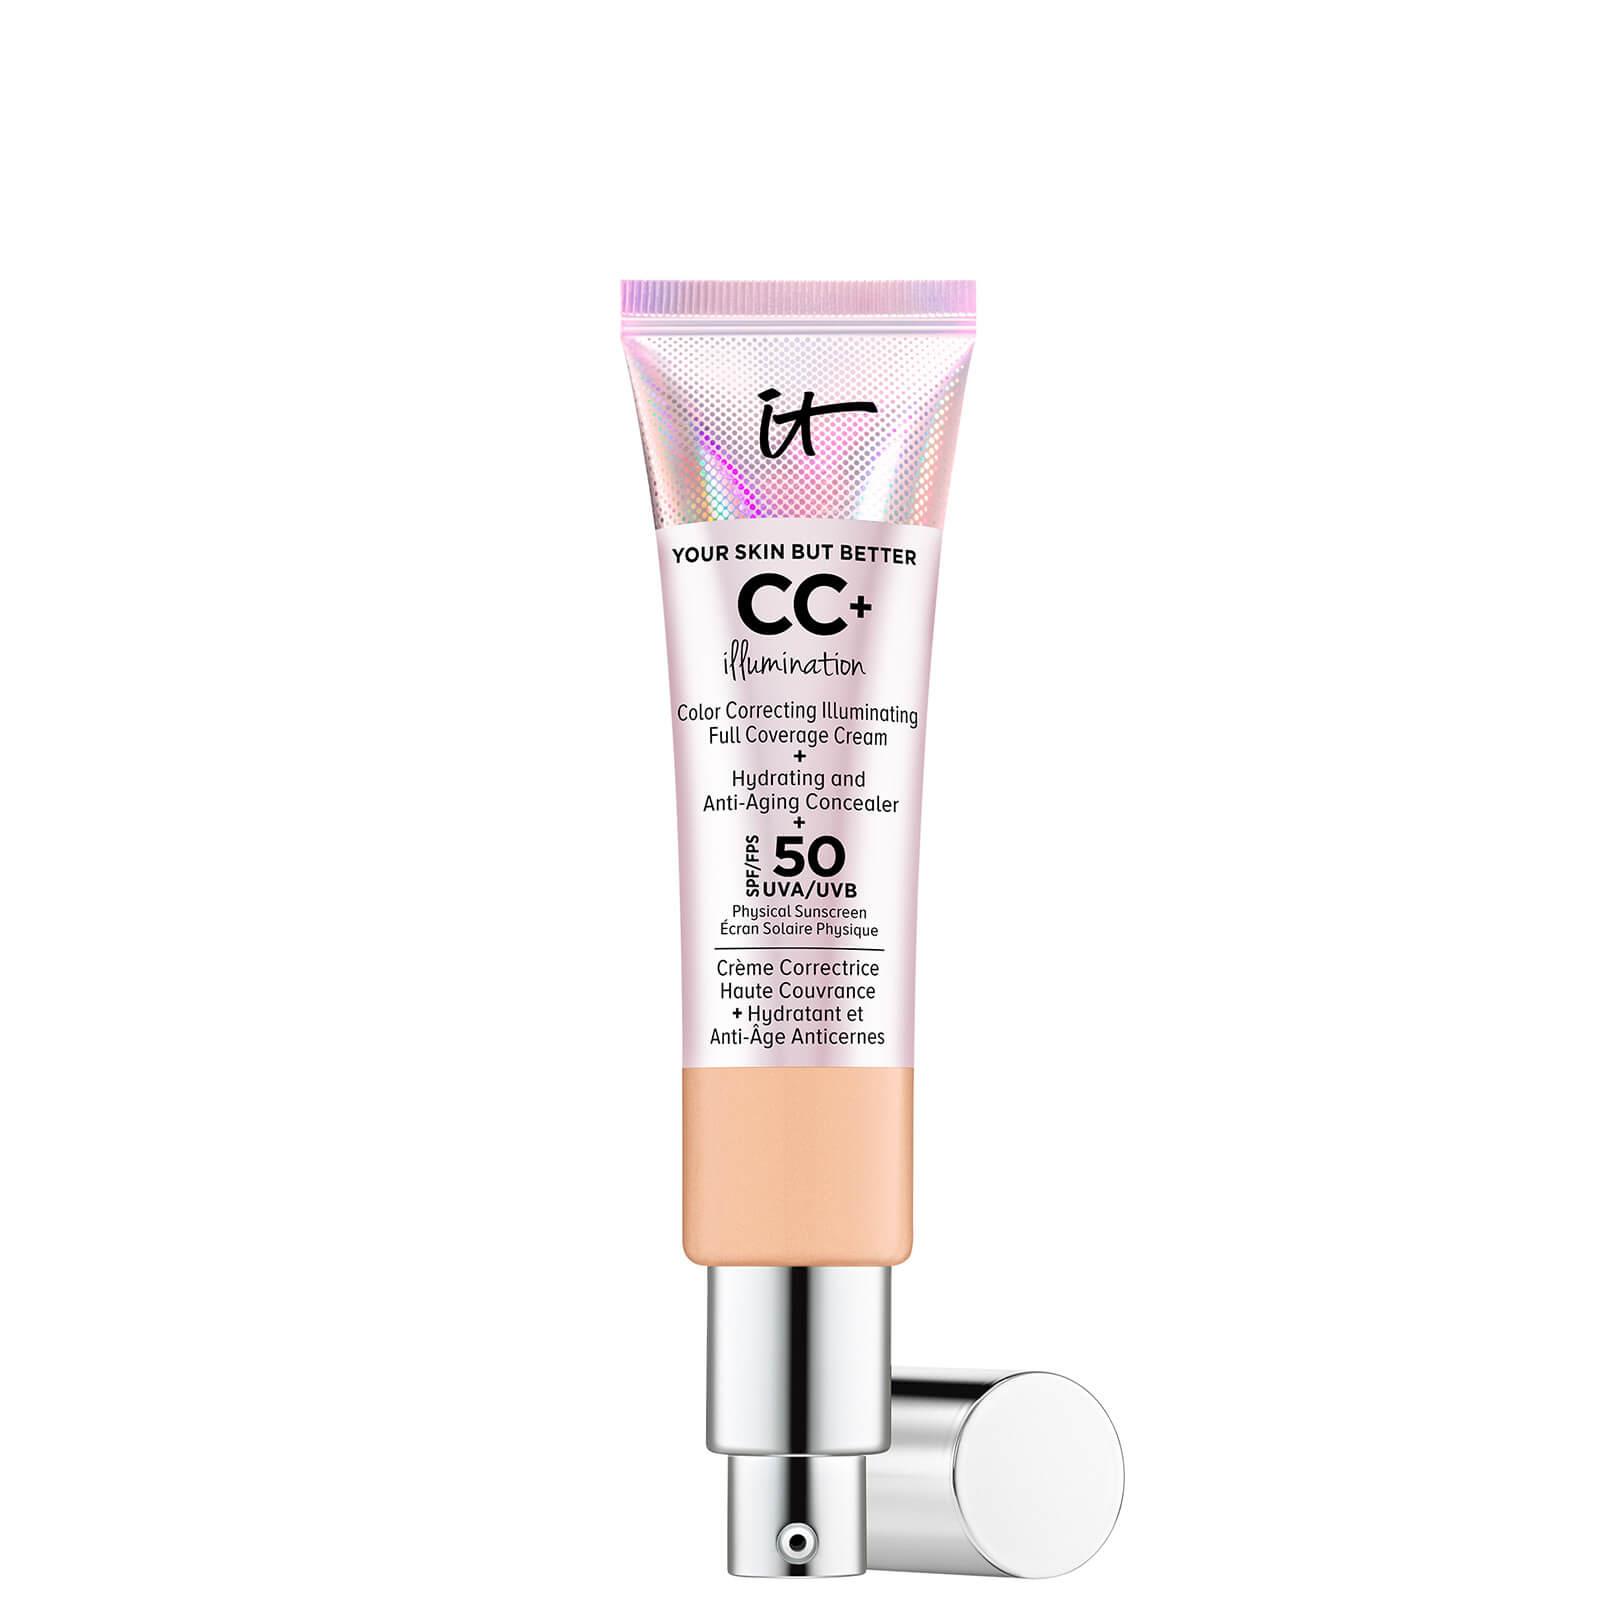 Купить IT Cosmetics Your Skin But Better CC+ Illumination SPF50 32ml (Various Shades) - Neutral Medium